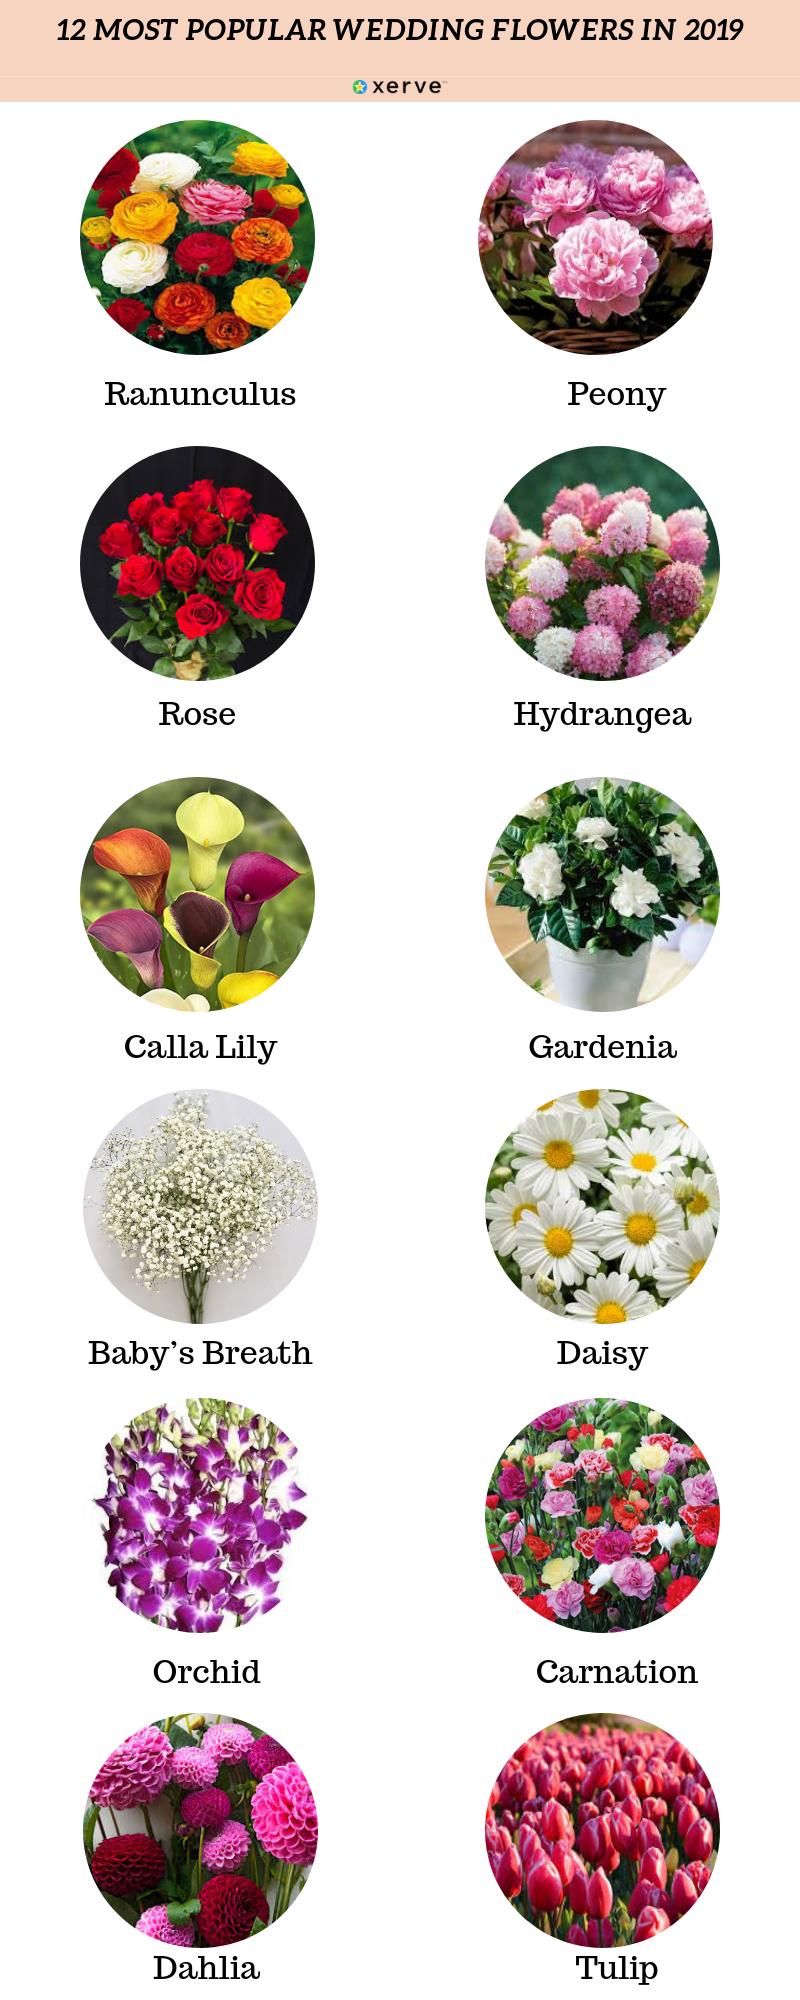 The 12 Most Popular Wedding Flowers In 2019 In 2020 Wedding Flower Types Wedding Flowers Popular Flowers